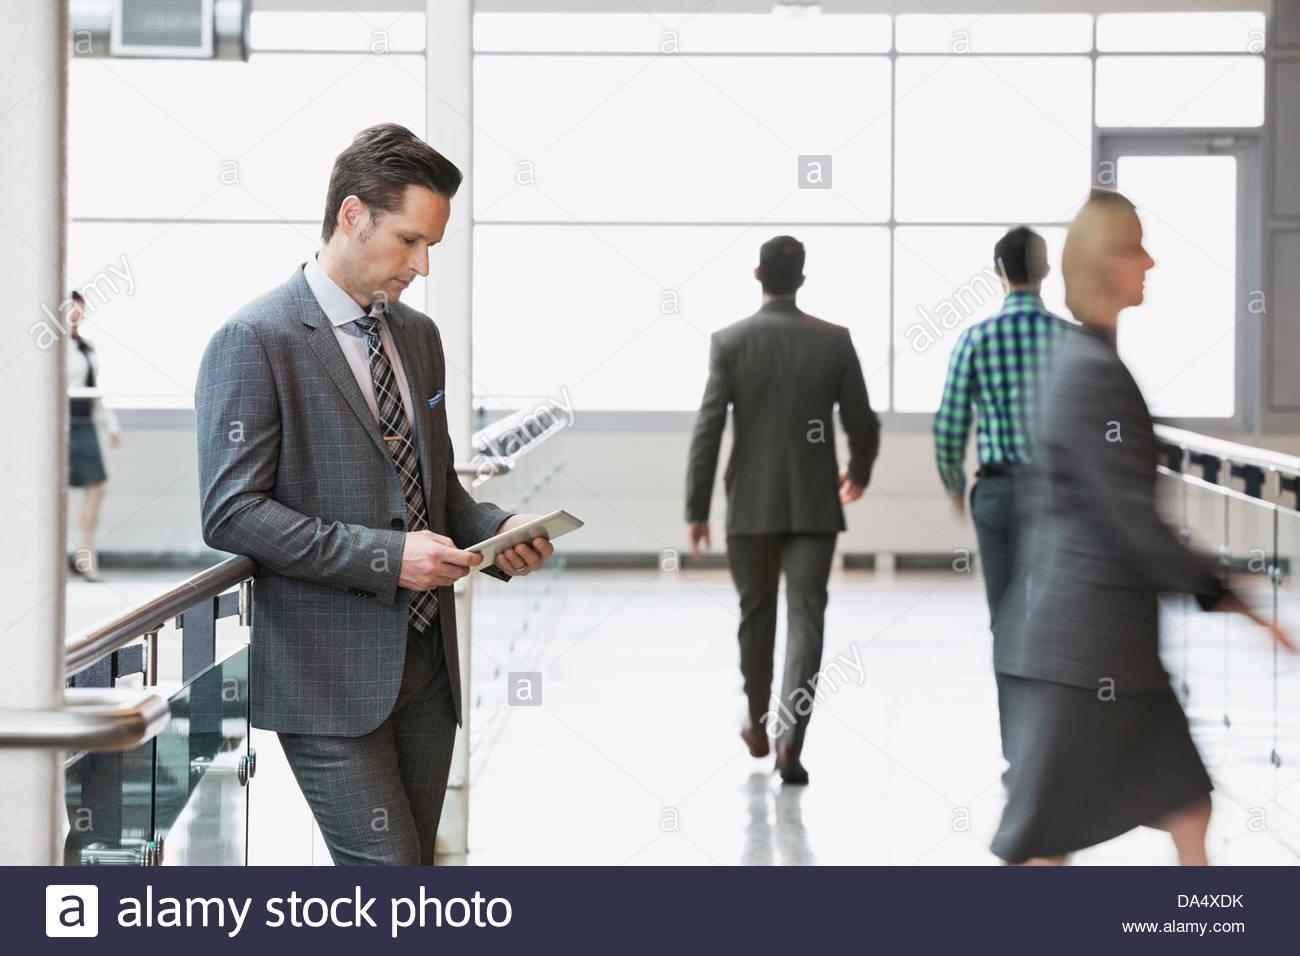 Businessman using digital tablet in office building - Stock Image